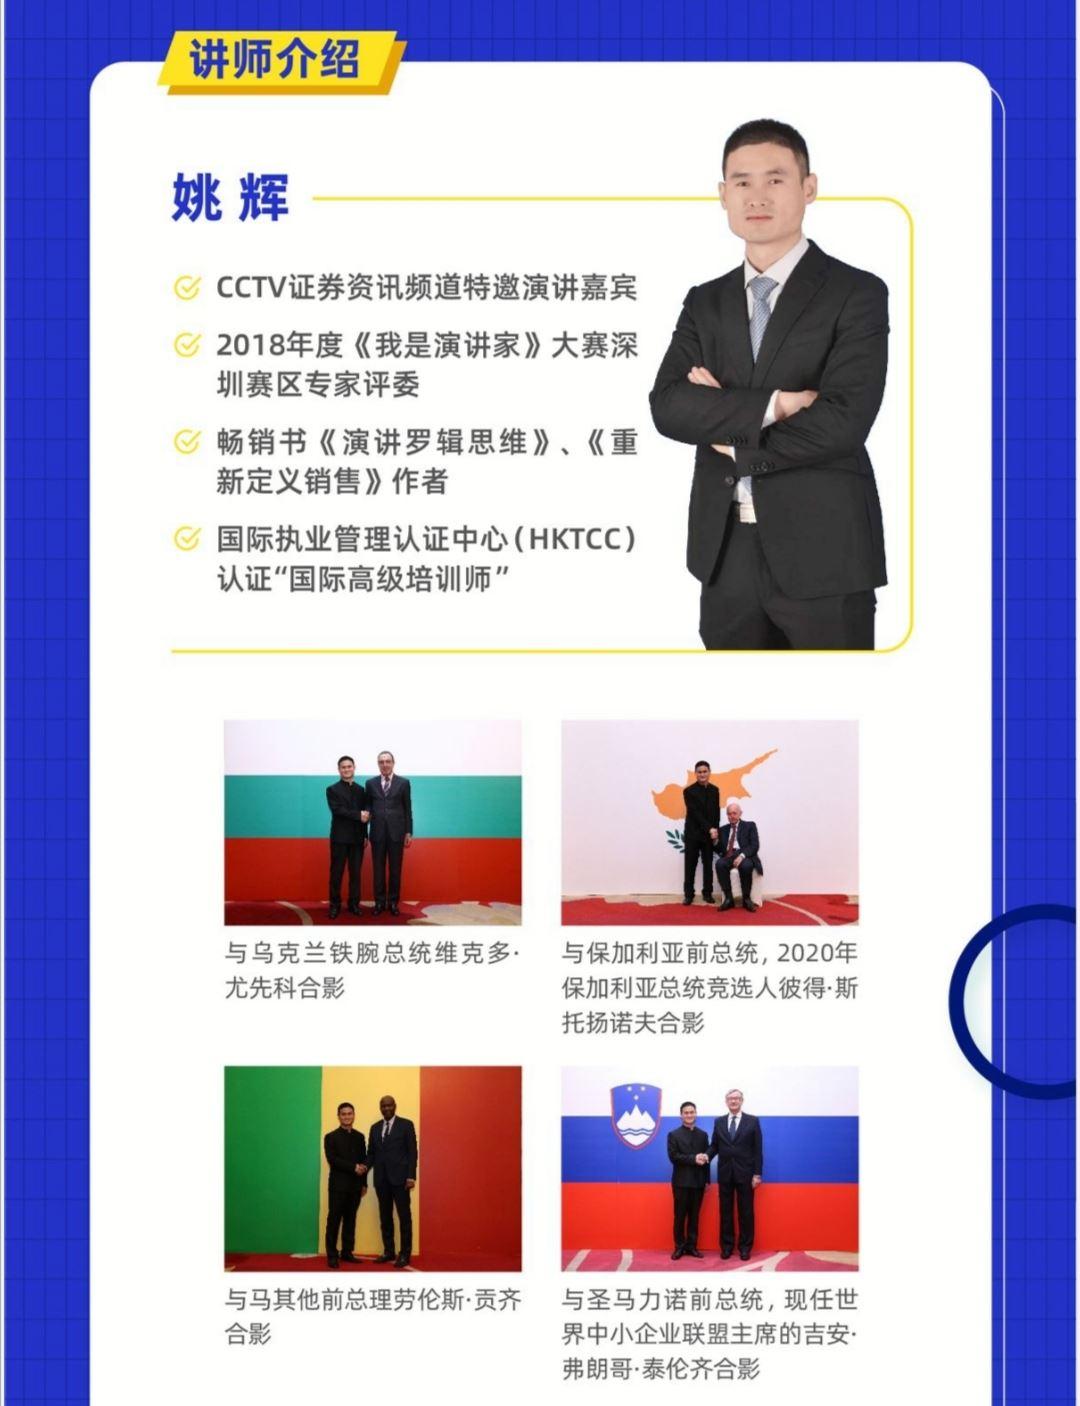 http://www.huodongxing.com/file/20160330/2512280531473/834134535625465.jpg